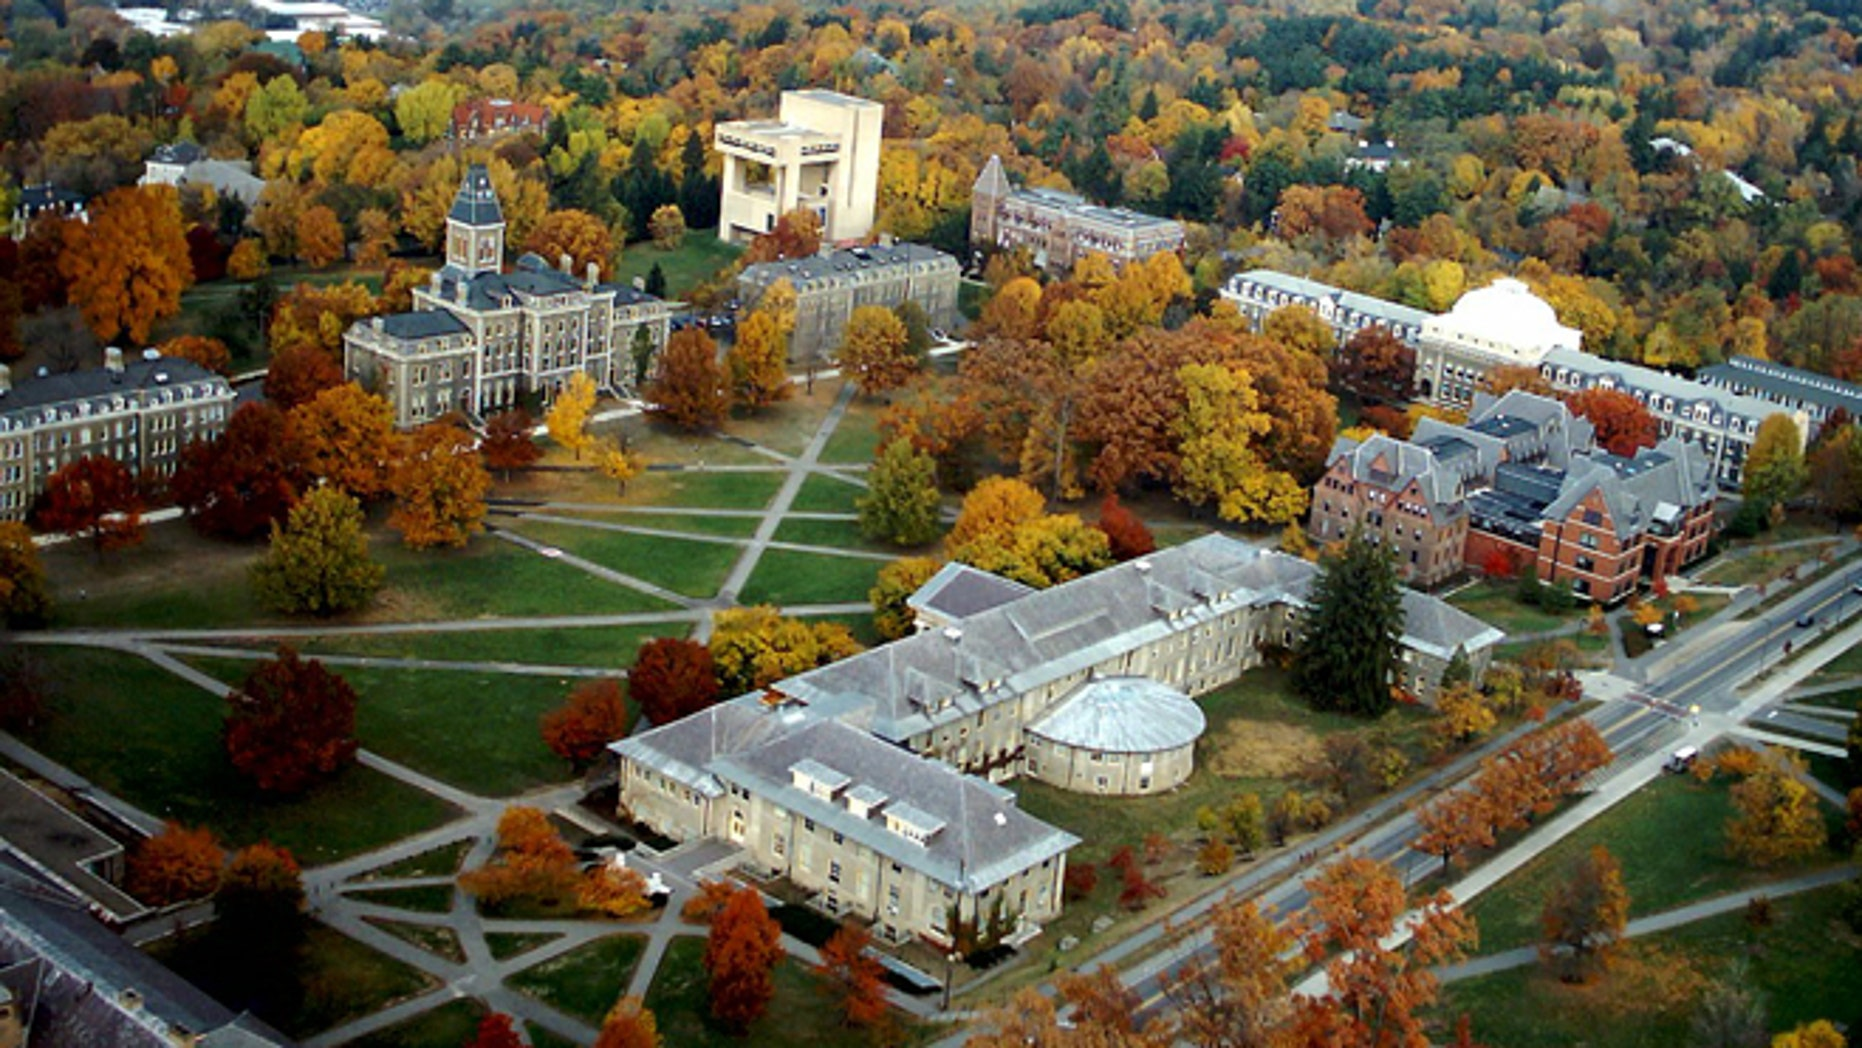 Cornell University is shown (Credit: Cornell University)